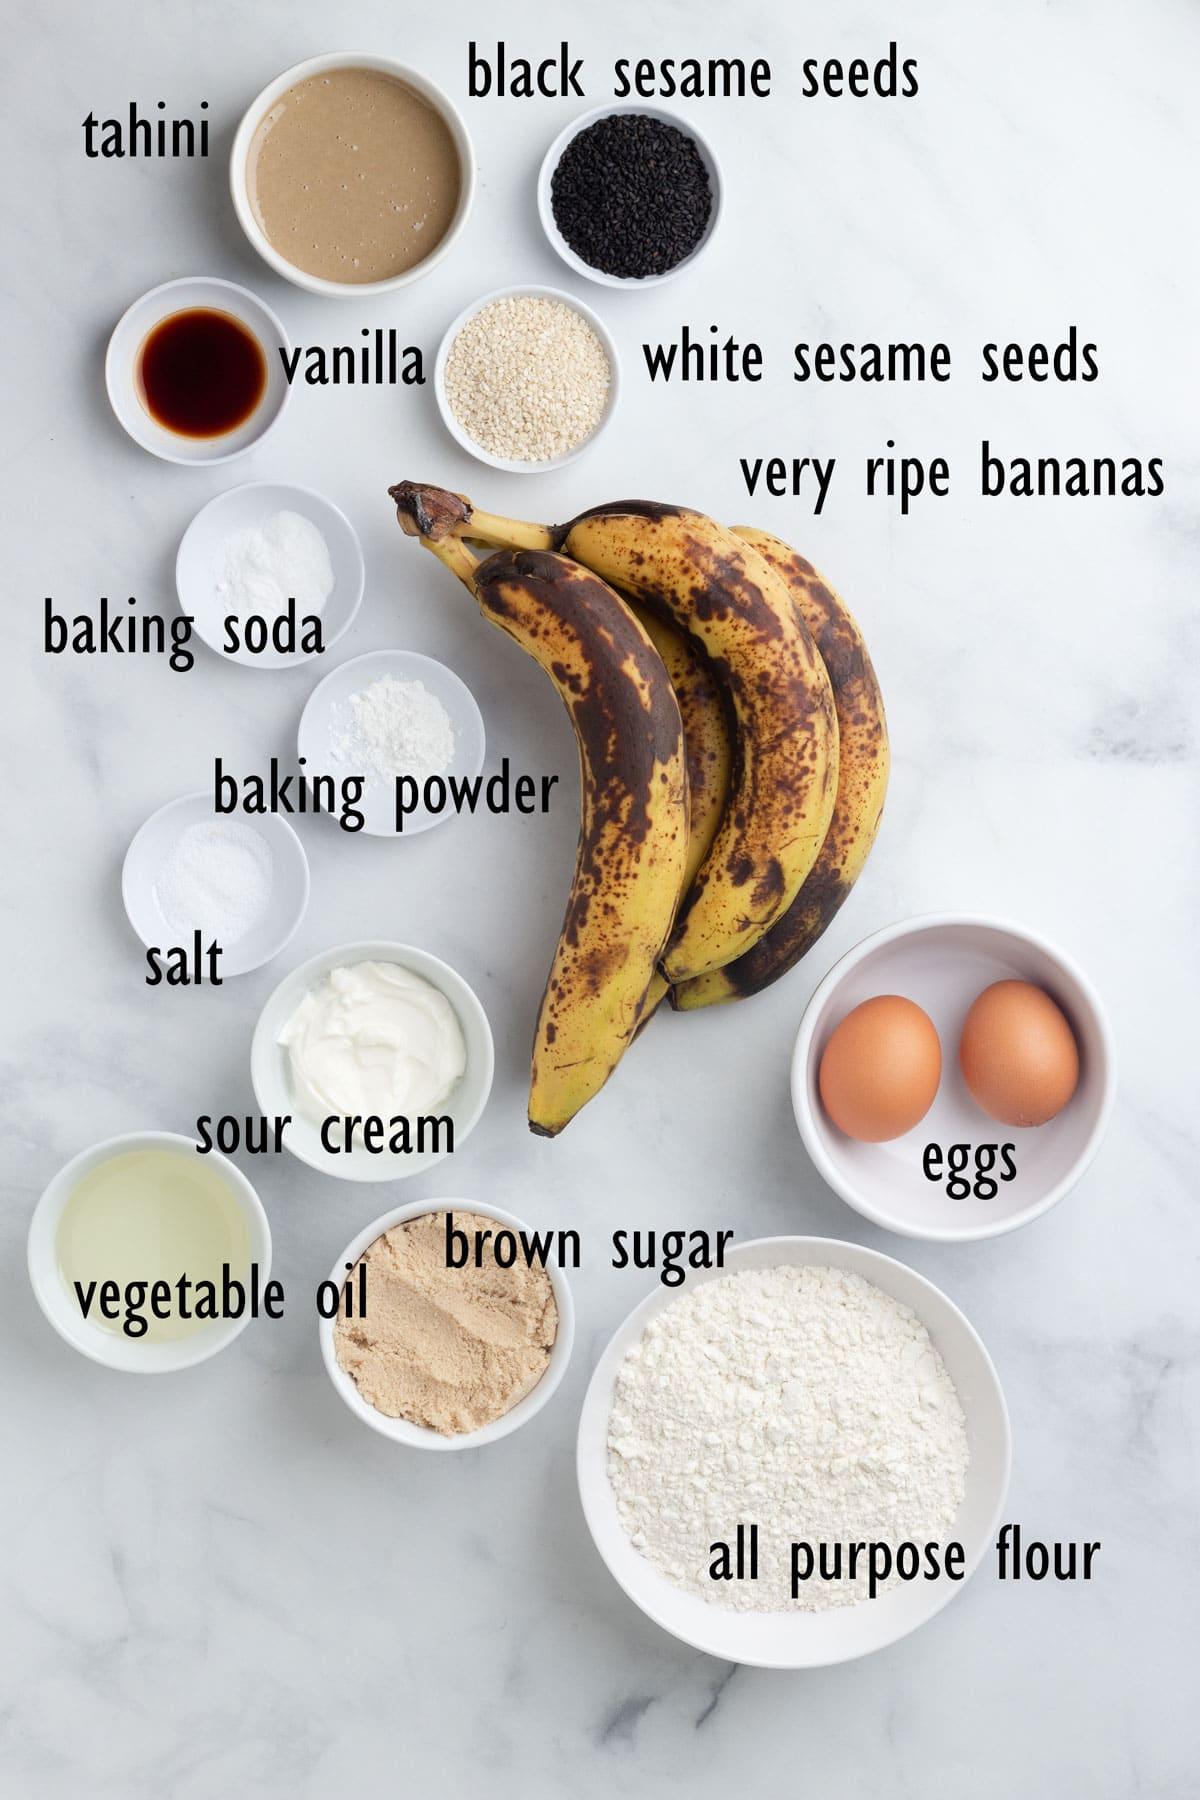 Banana Bread Ingredients including bananas, black and white sesame seeds, tahini, flour, brown sugar and eggs.